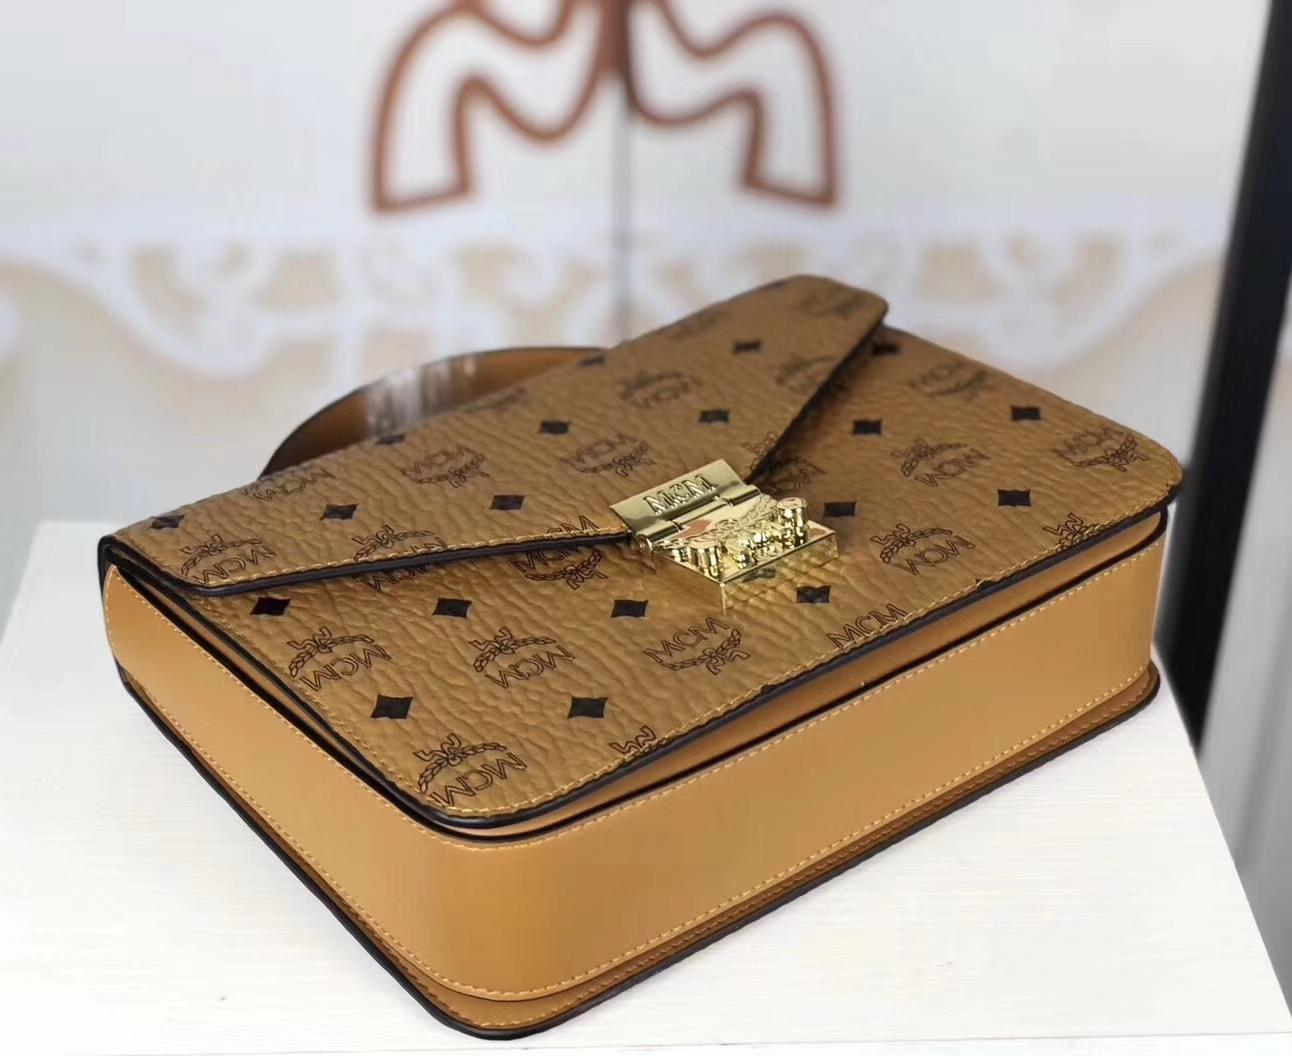 MCM Patricia斜挎包 Visetos涂层帆布精心制作 侧面饰有精致的皮革装饰